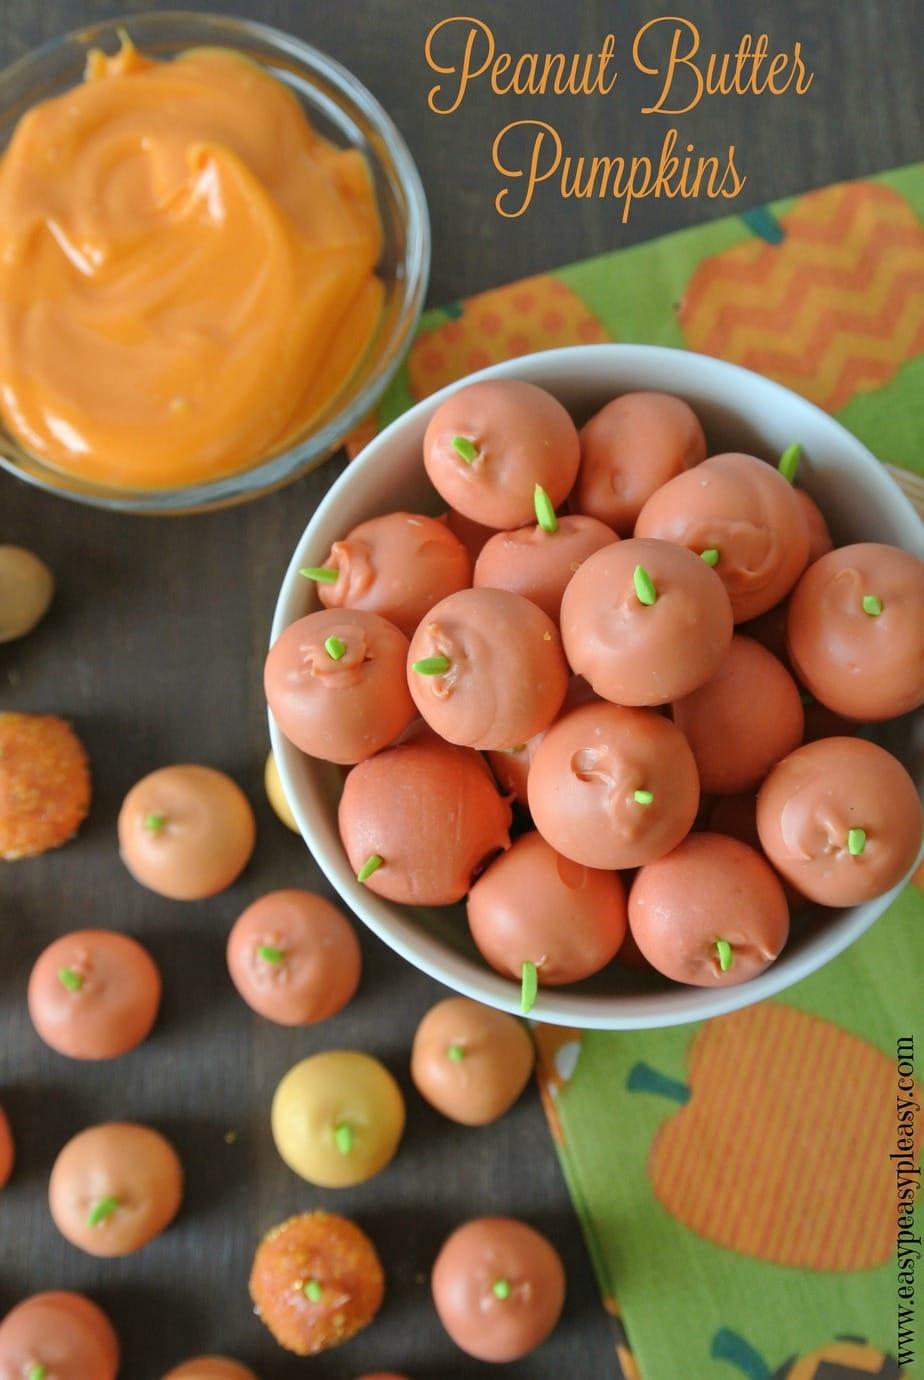 Easy 3 Ingredient Peanut Butter Pumpkins!